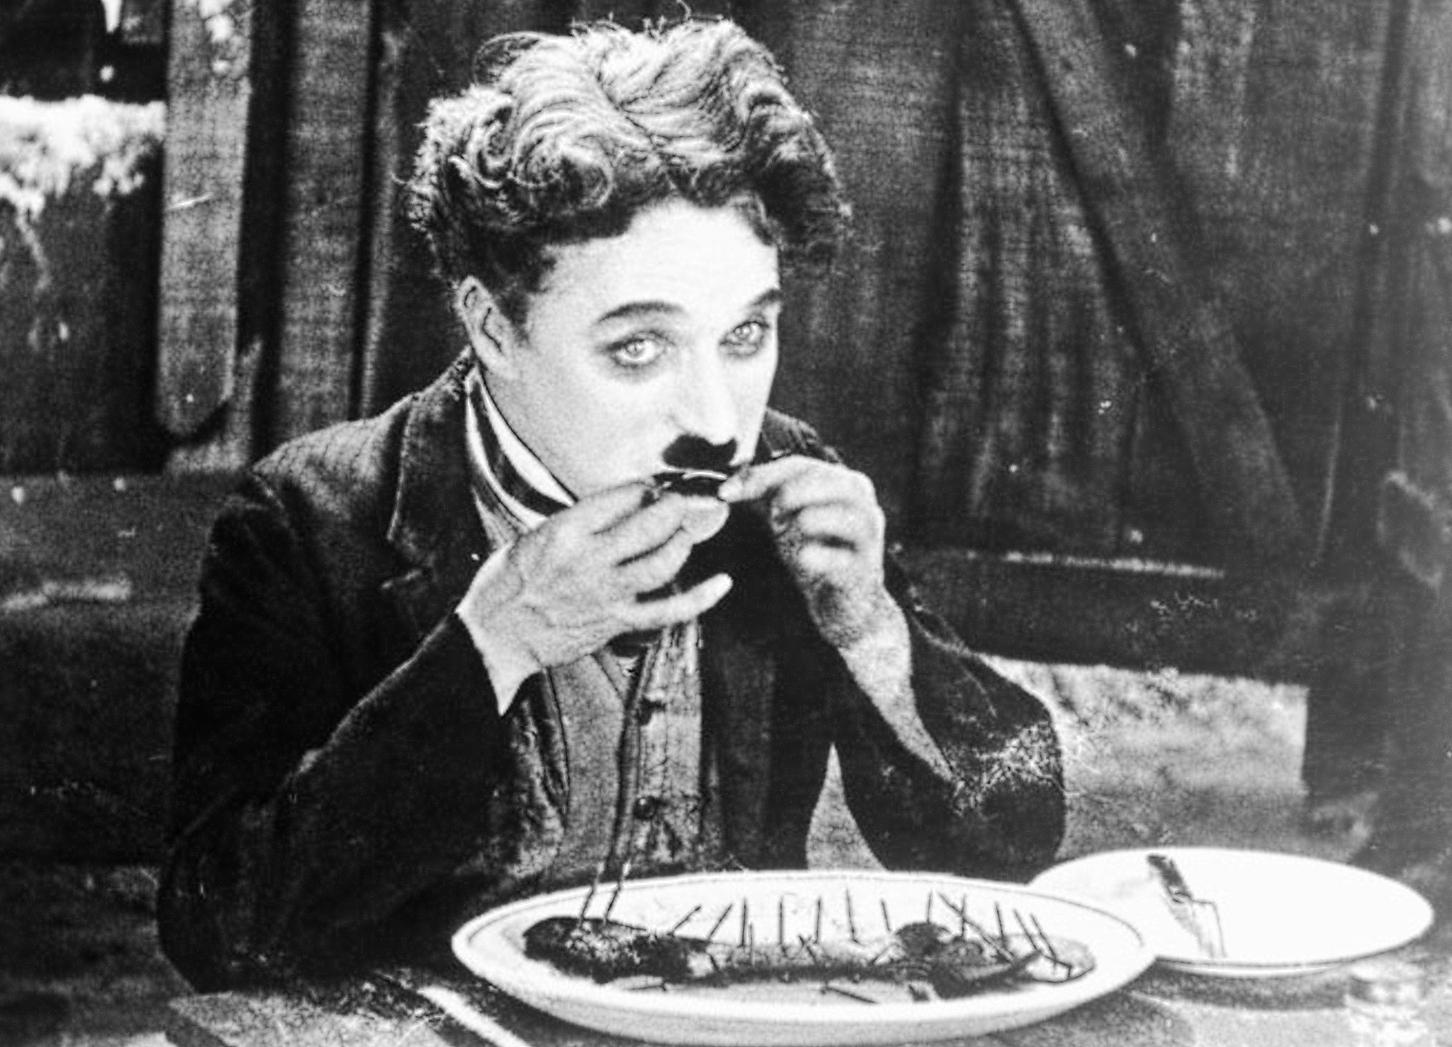 Famoso Fotograma de la película : The Gold Rush en el que podemos ver a Charlot comiéndose una bota